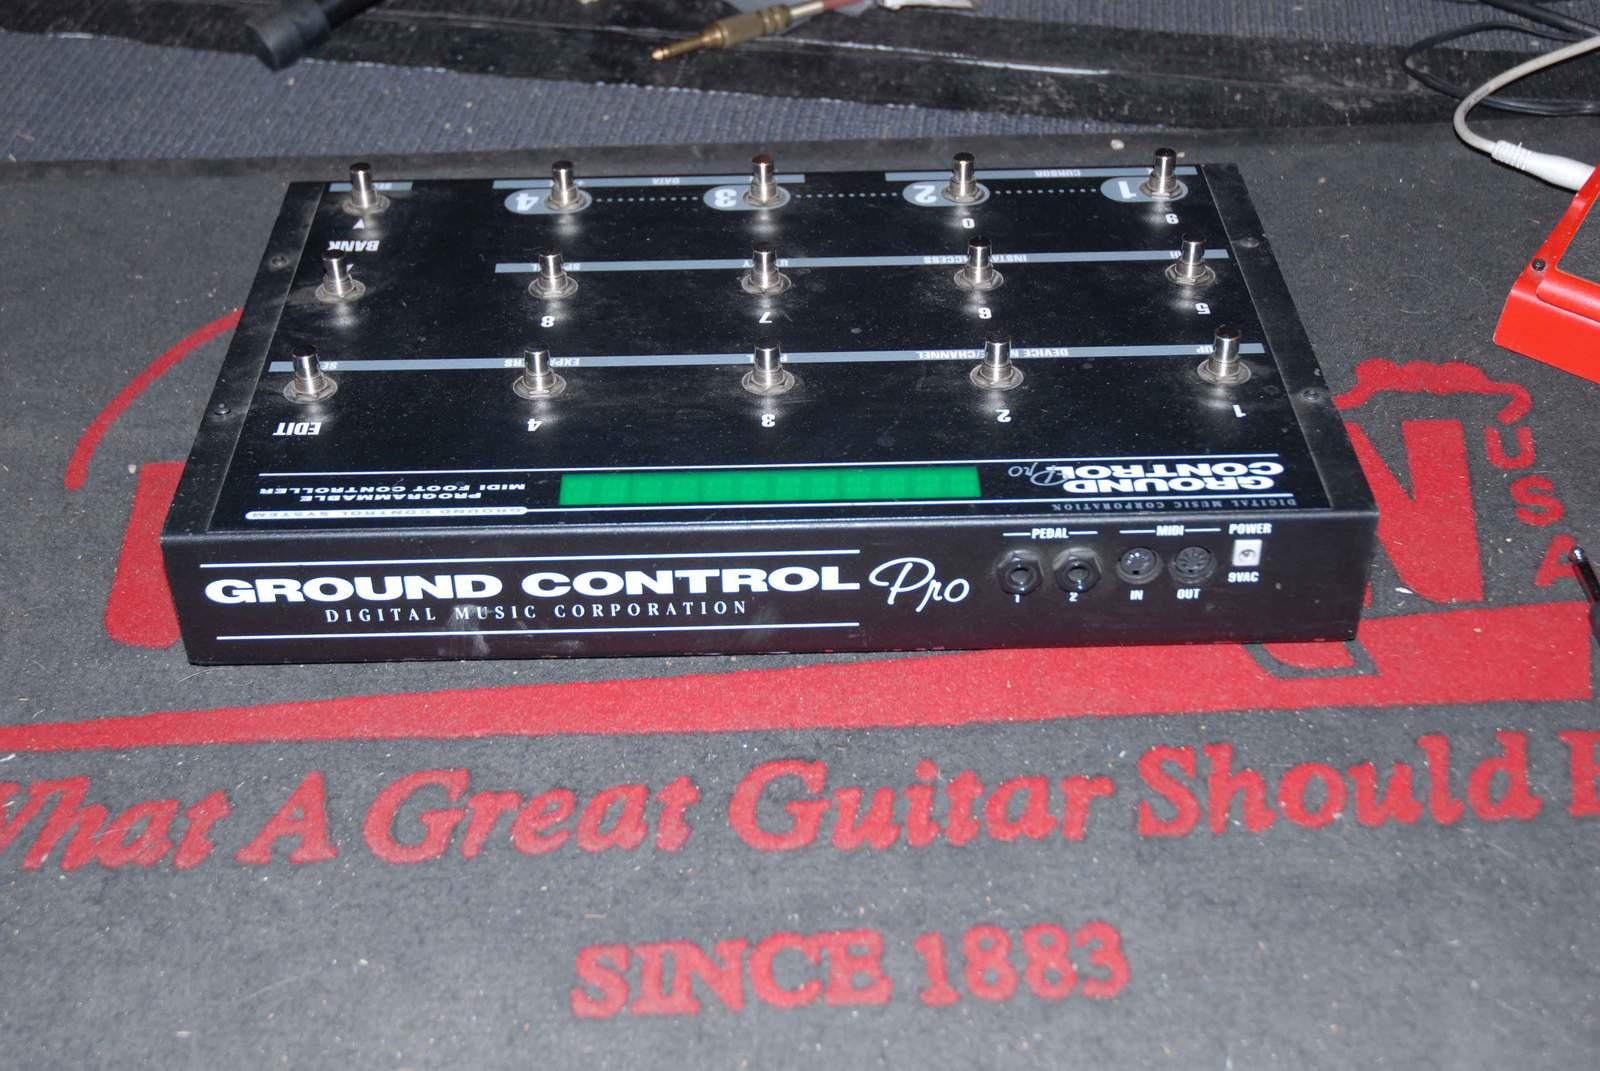 voodoo lab ground control pro image 185799 audiofanzine. Black Bedroom Furniture Sets. Home Design Ideas